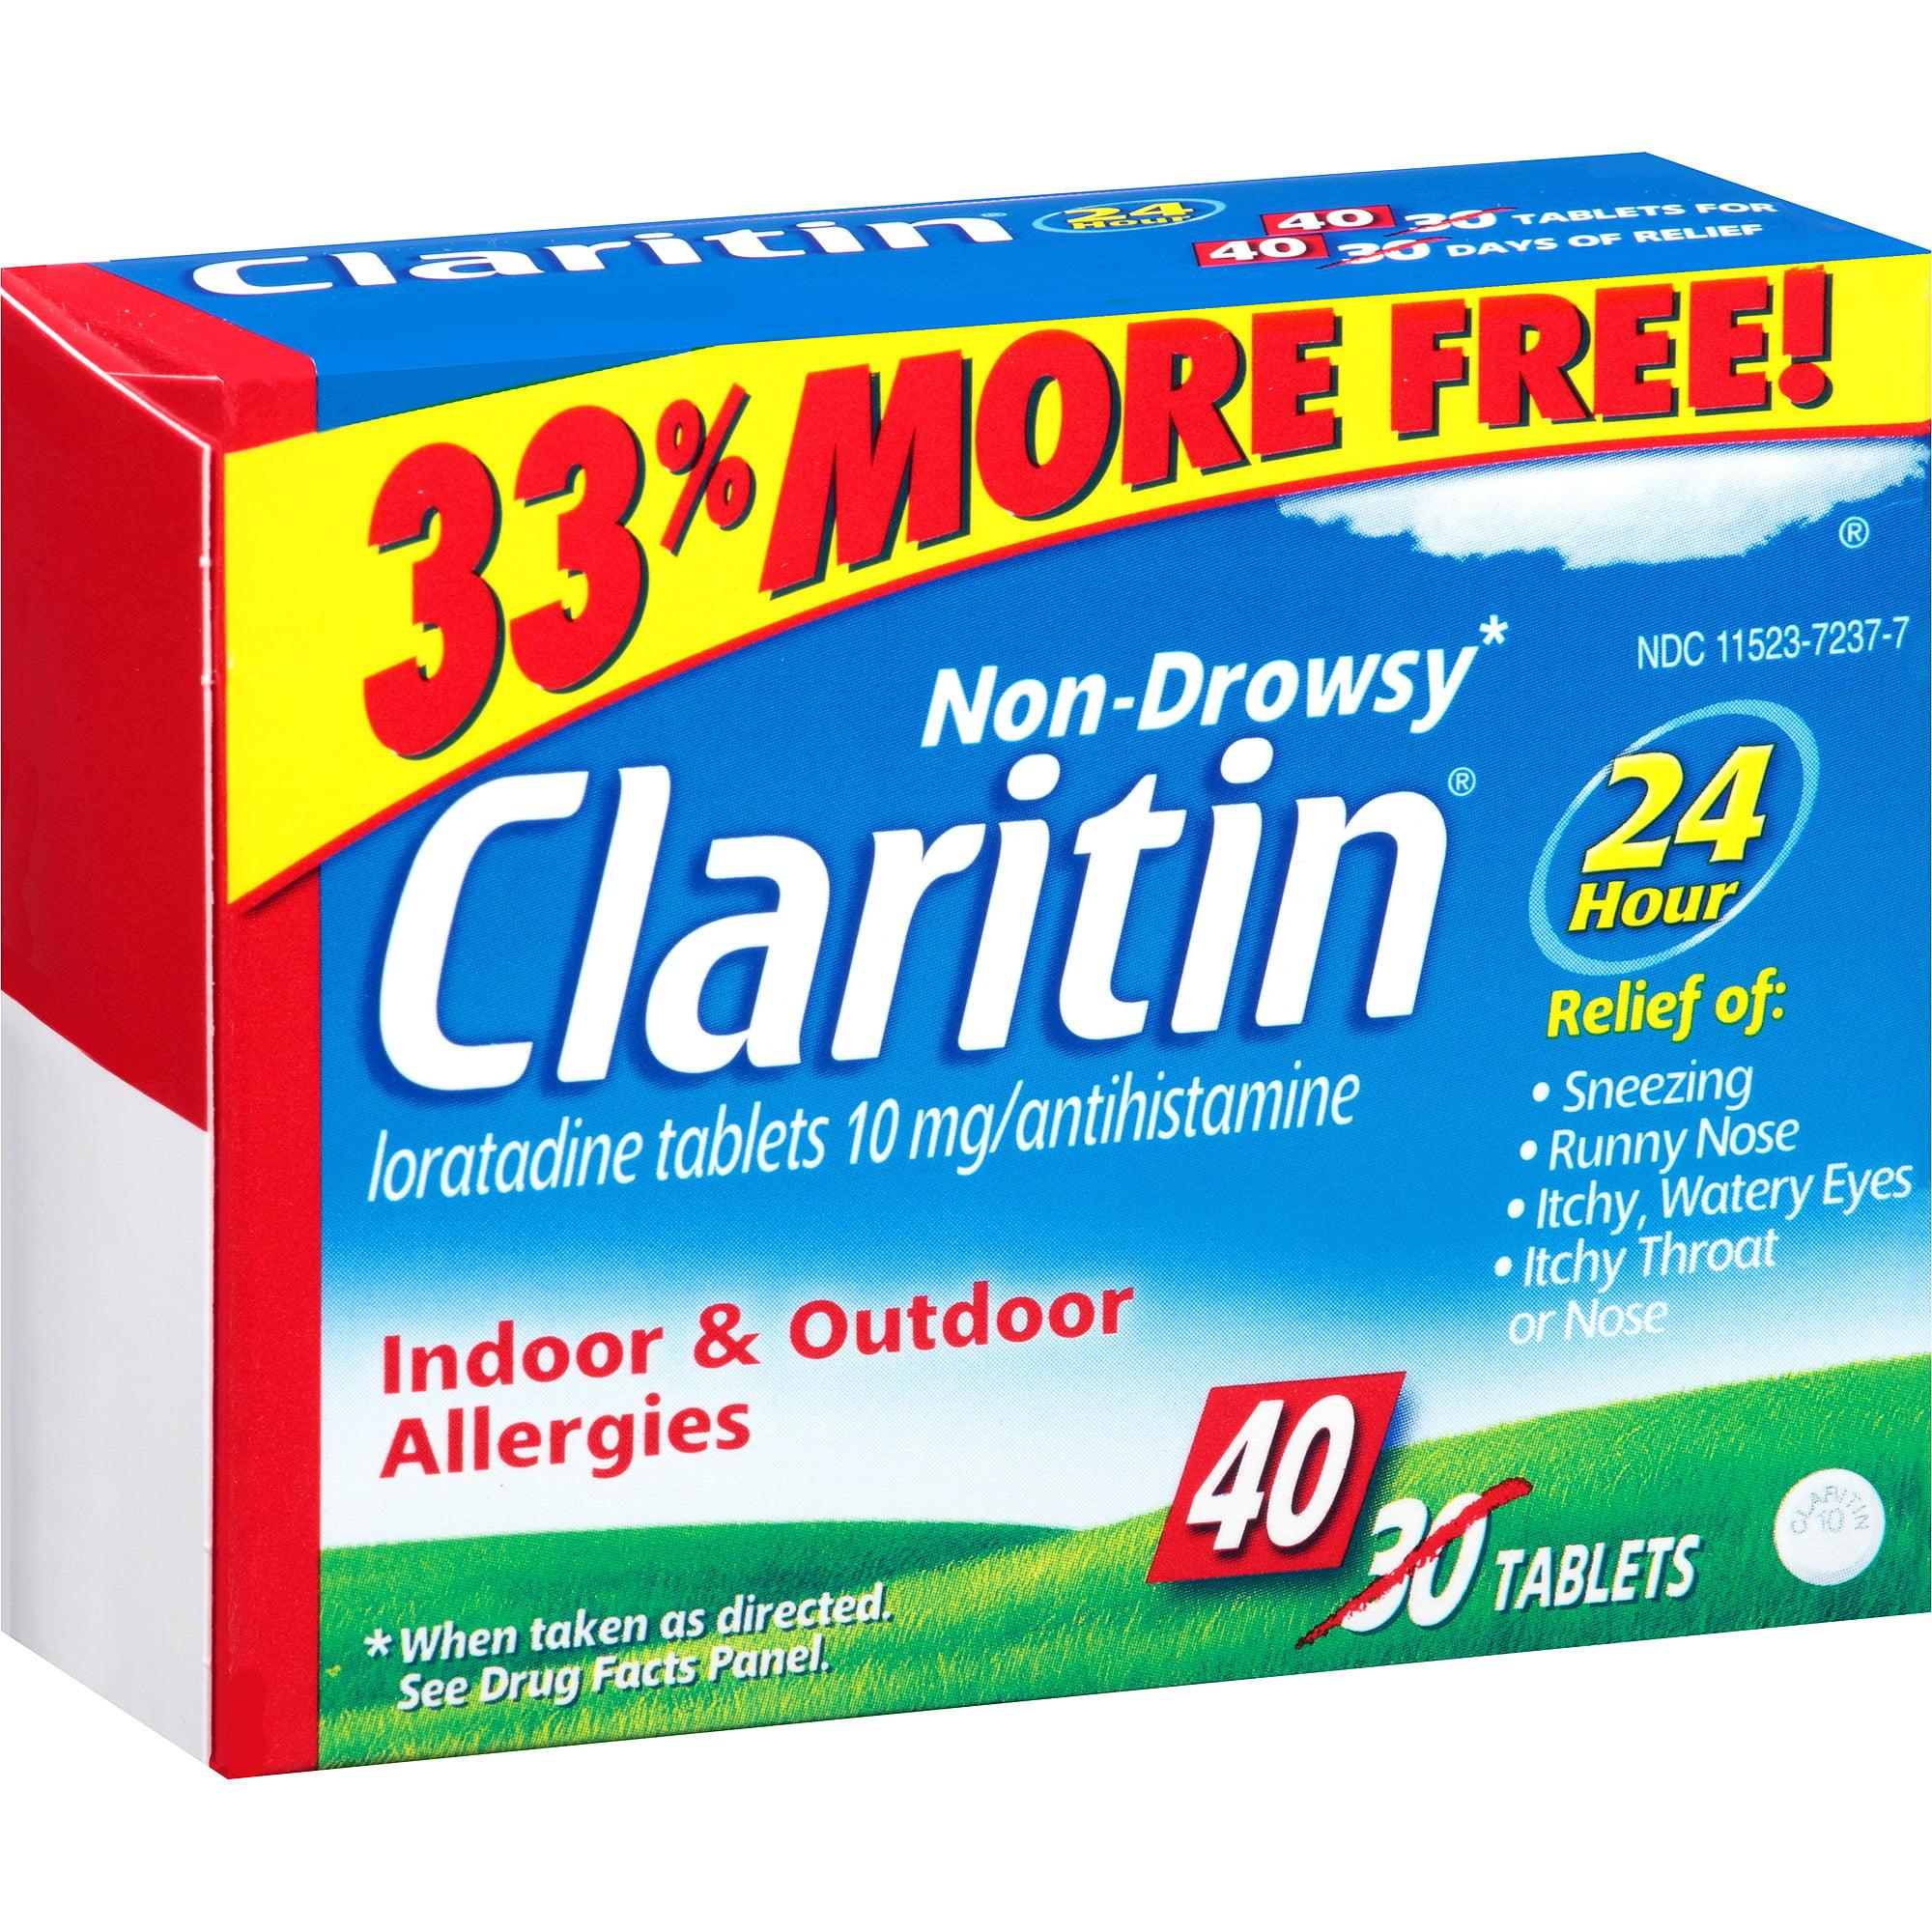 MSD Consumer Care Claritin  Indoor & Outdoor Allergies, 40 ea